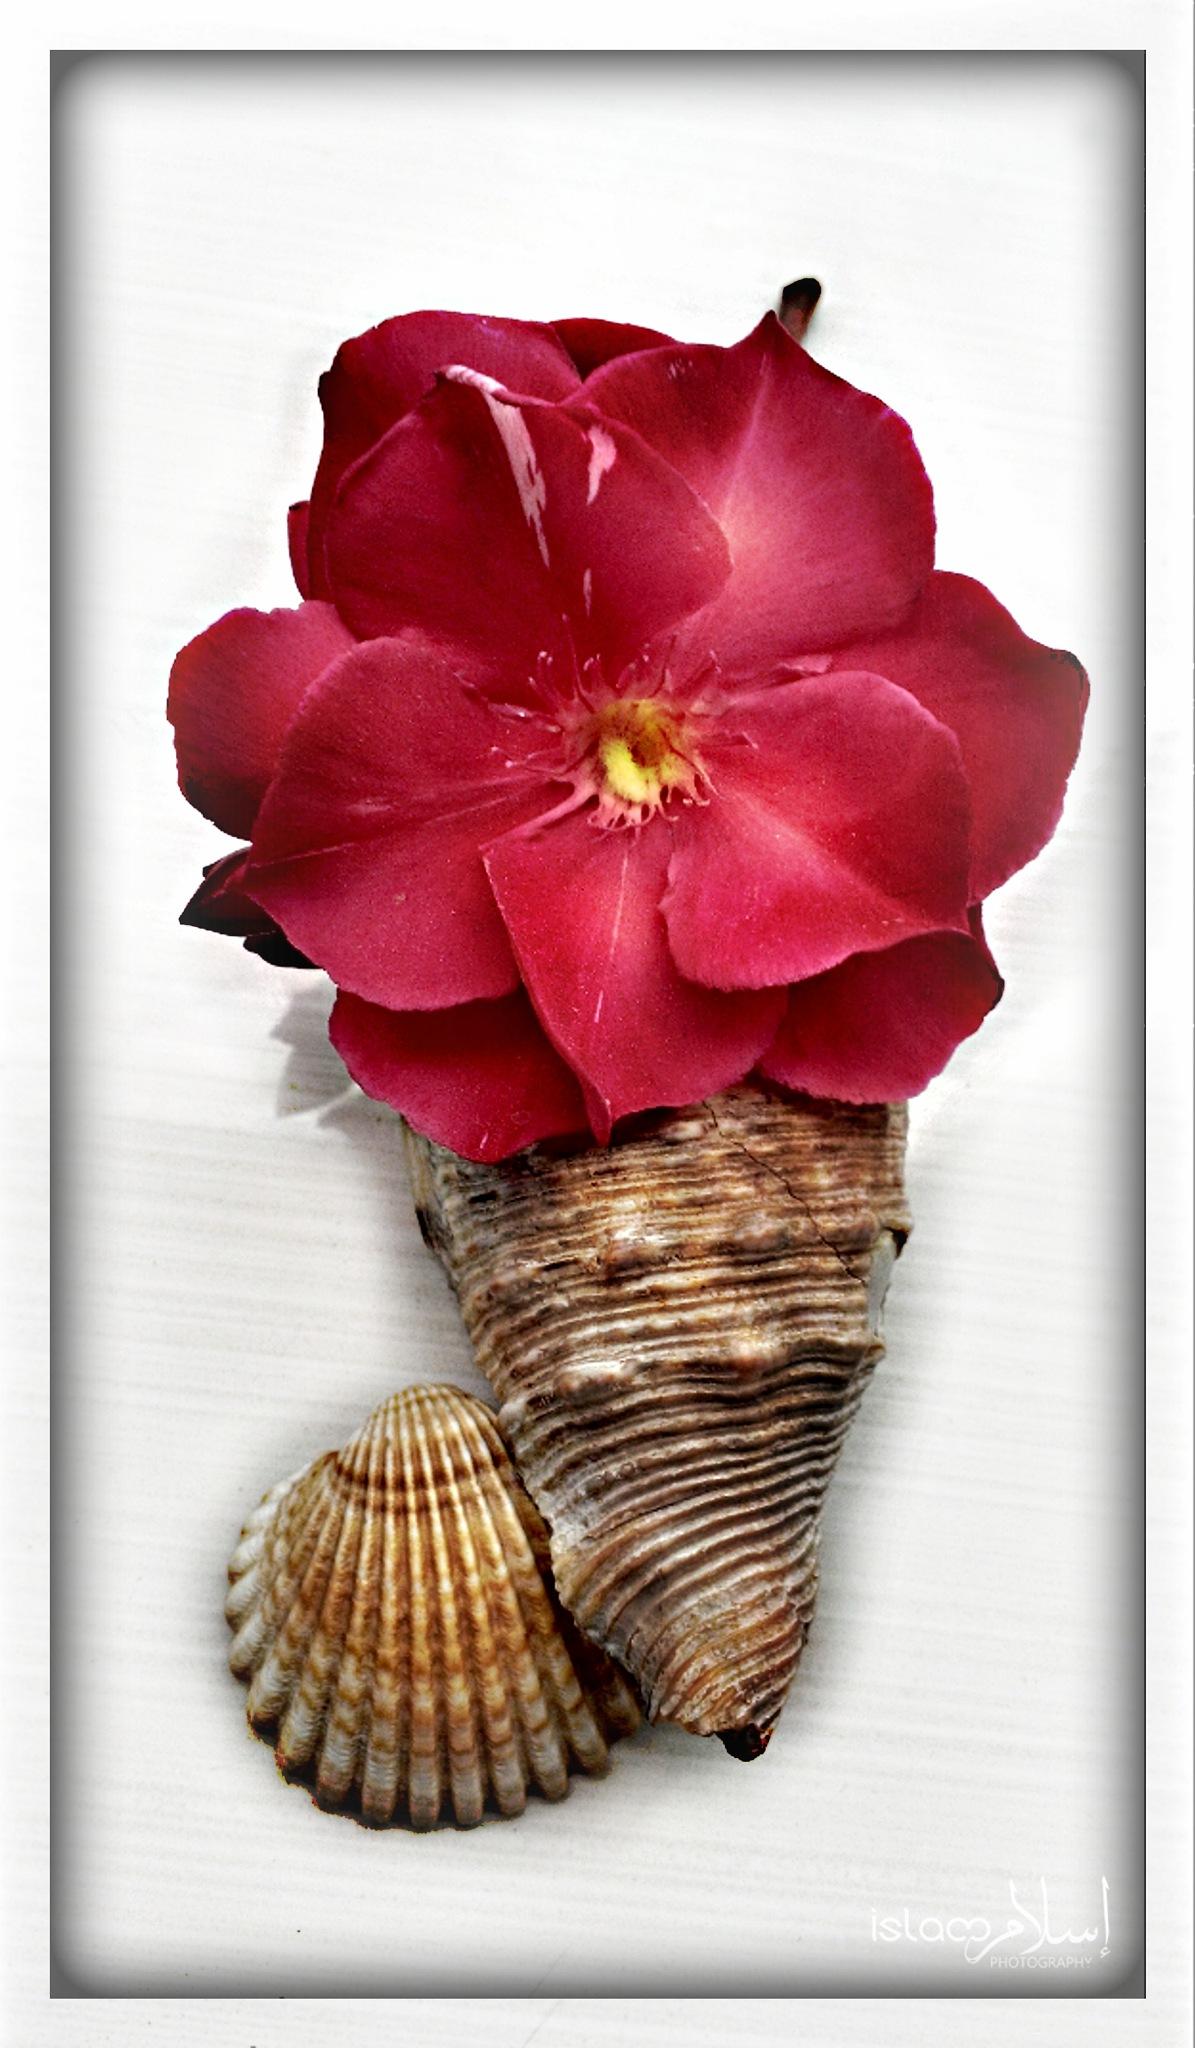 Seashells and a Flower.  by Islam Djellal